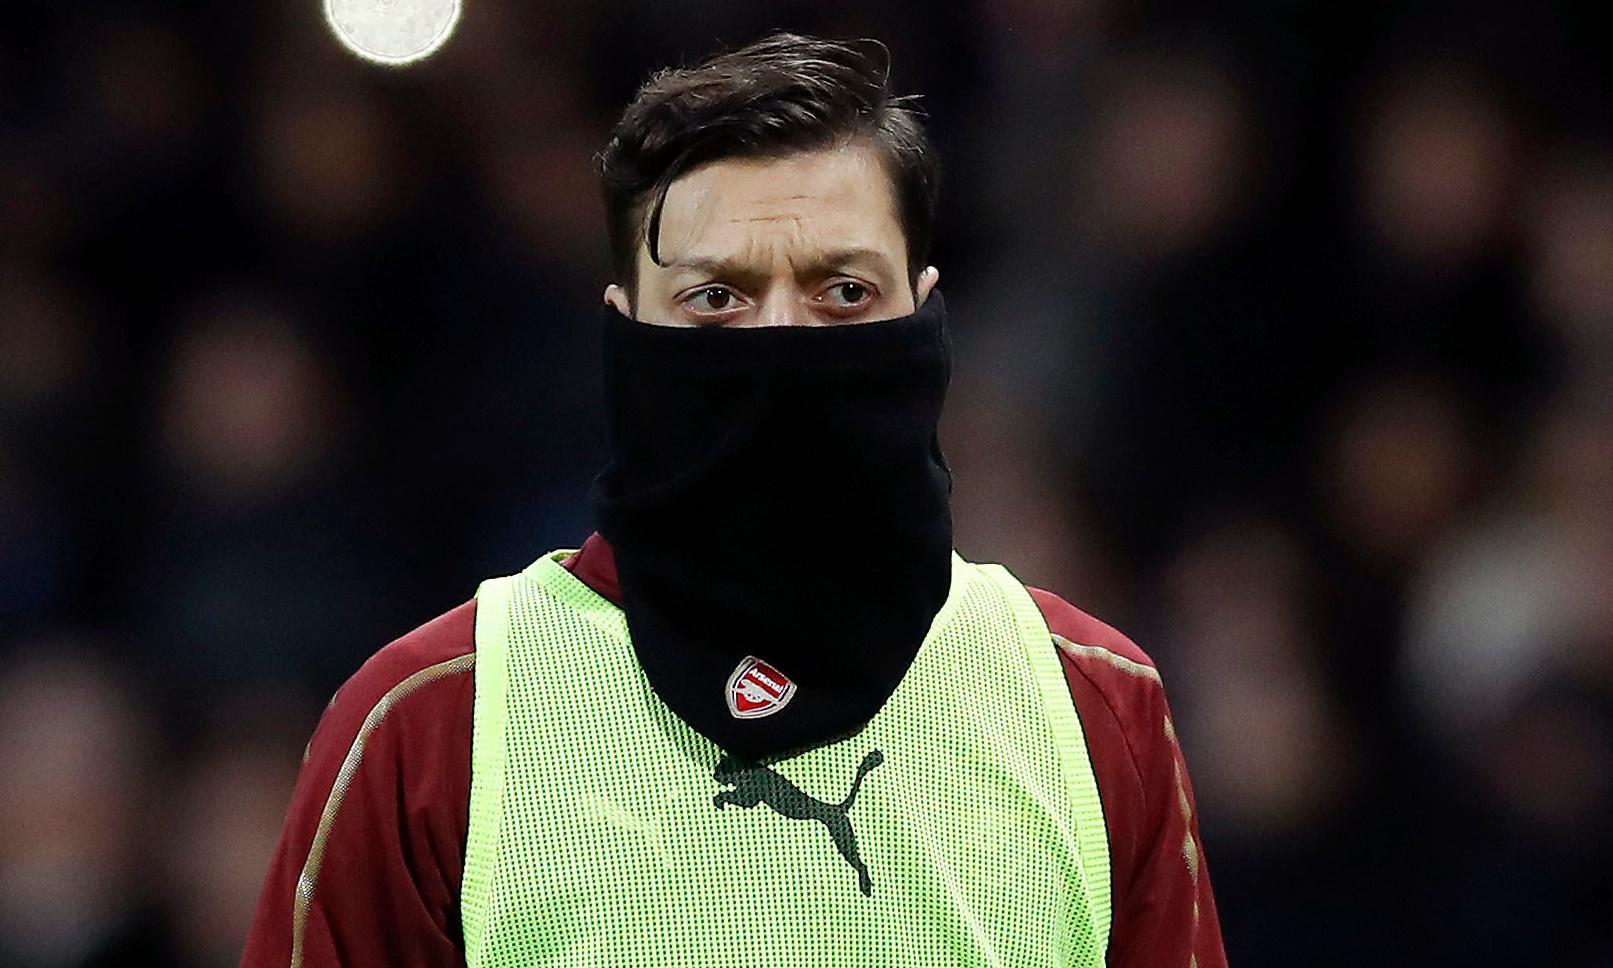 Arsène Wenger suggests Mesut Özil's new deal put him in 'comfort zone'